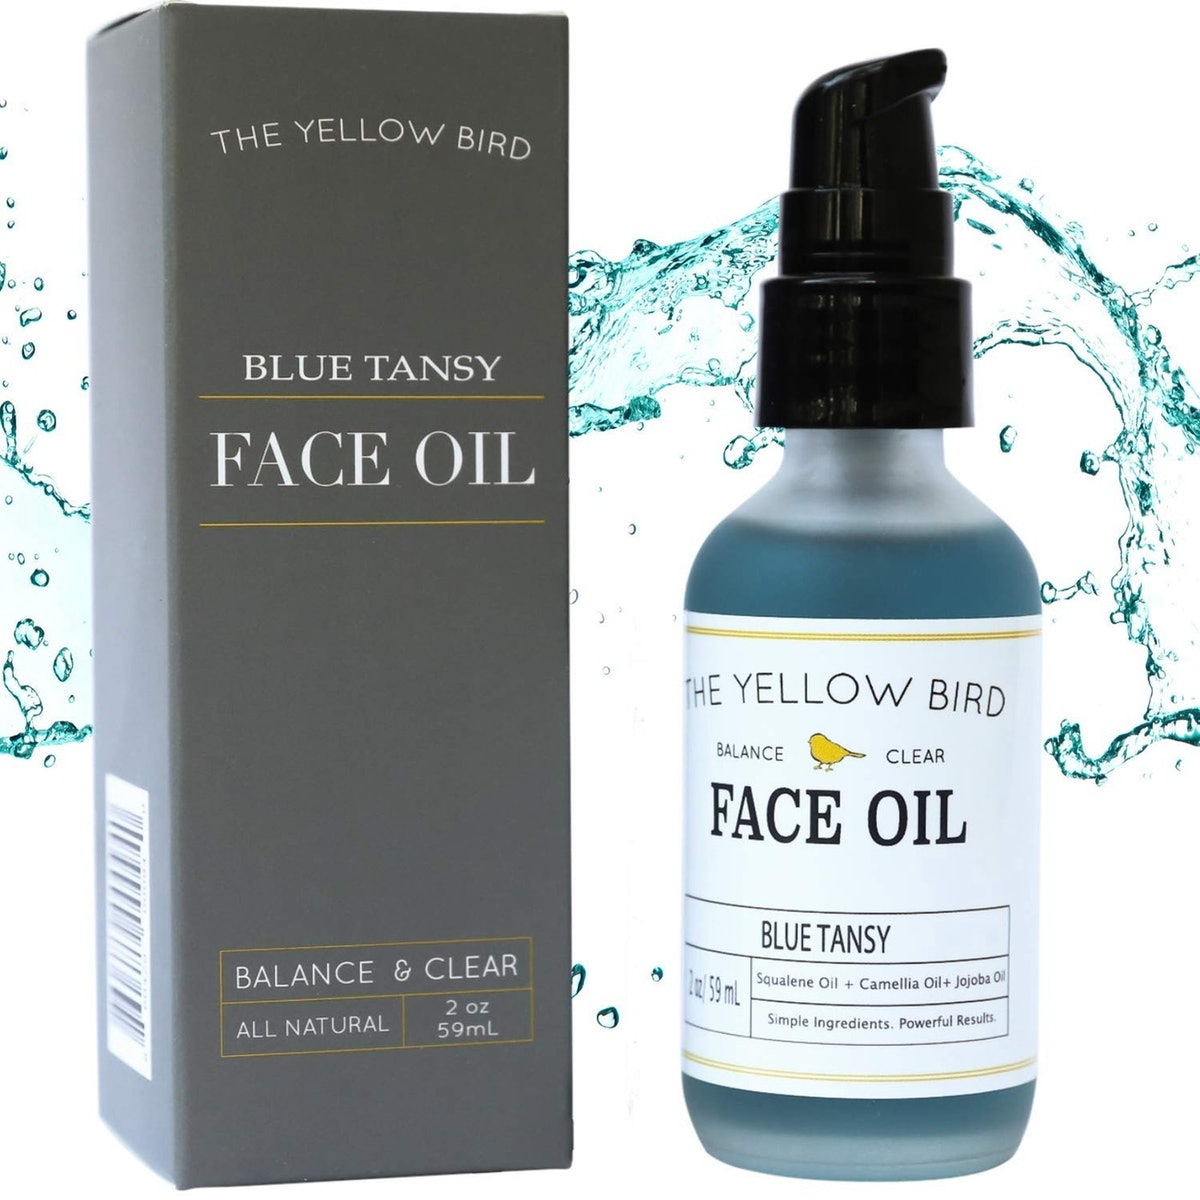 Balancing Blue Tansy Face Oil